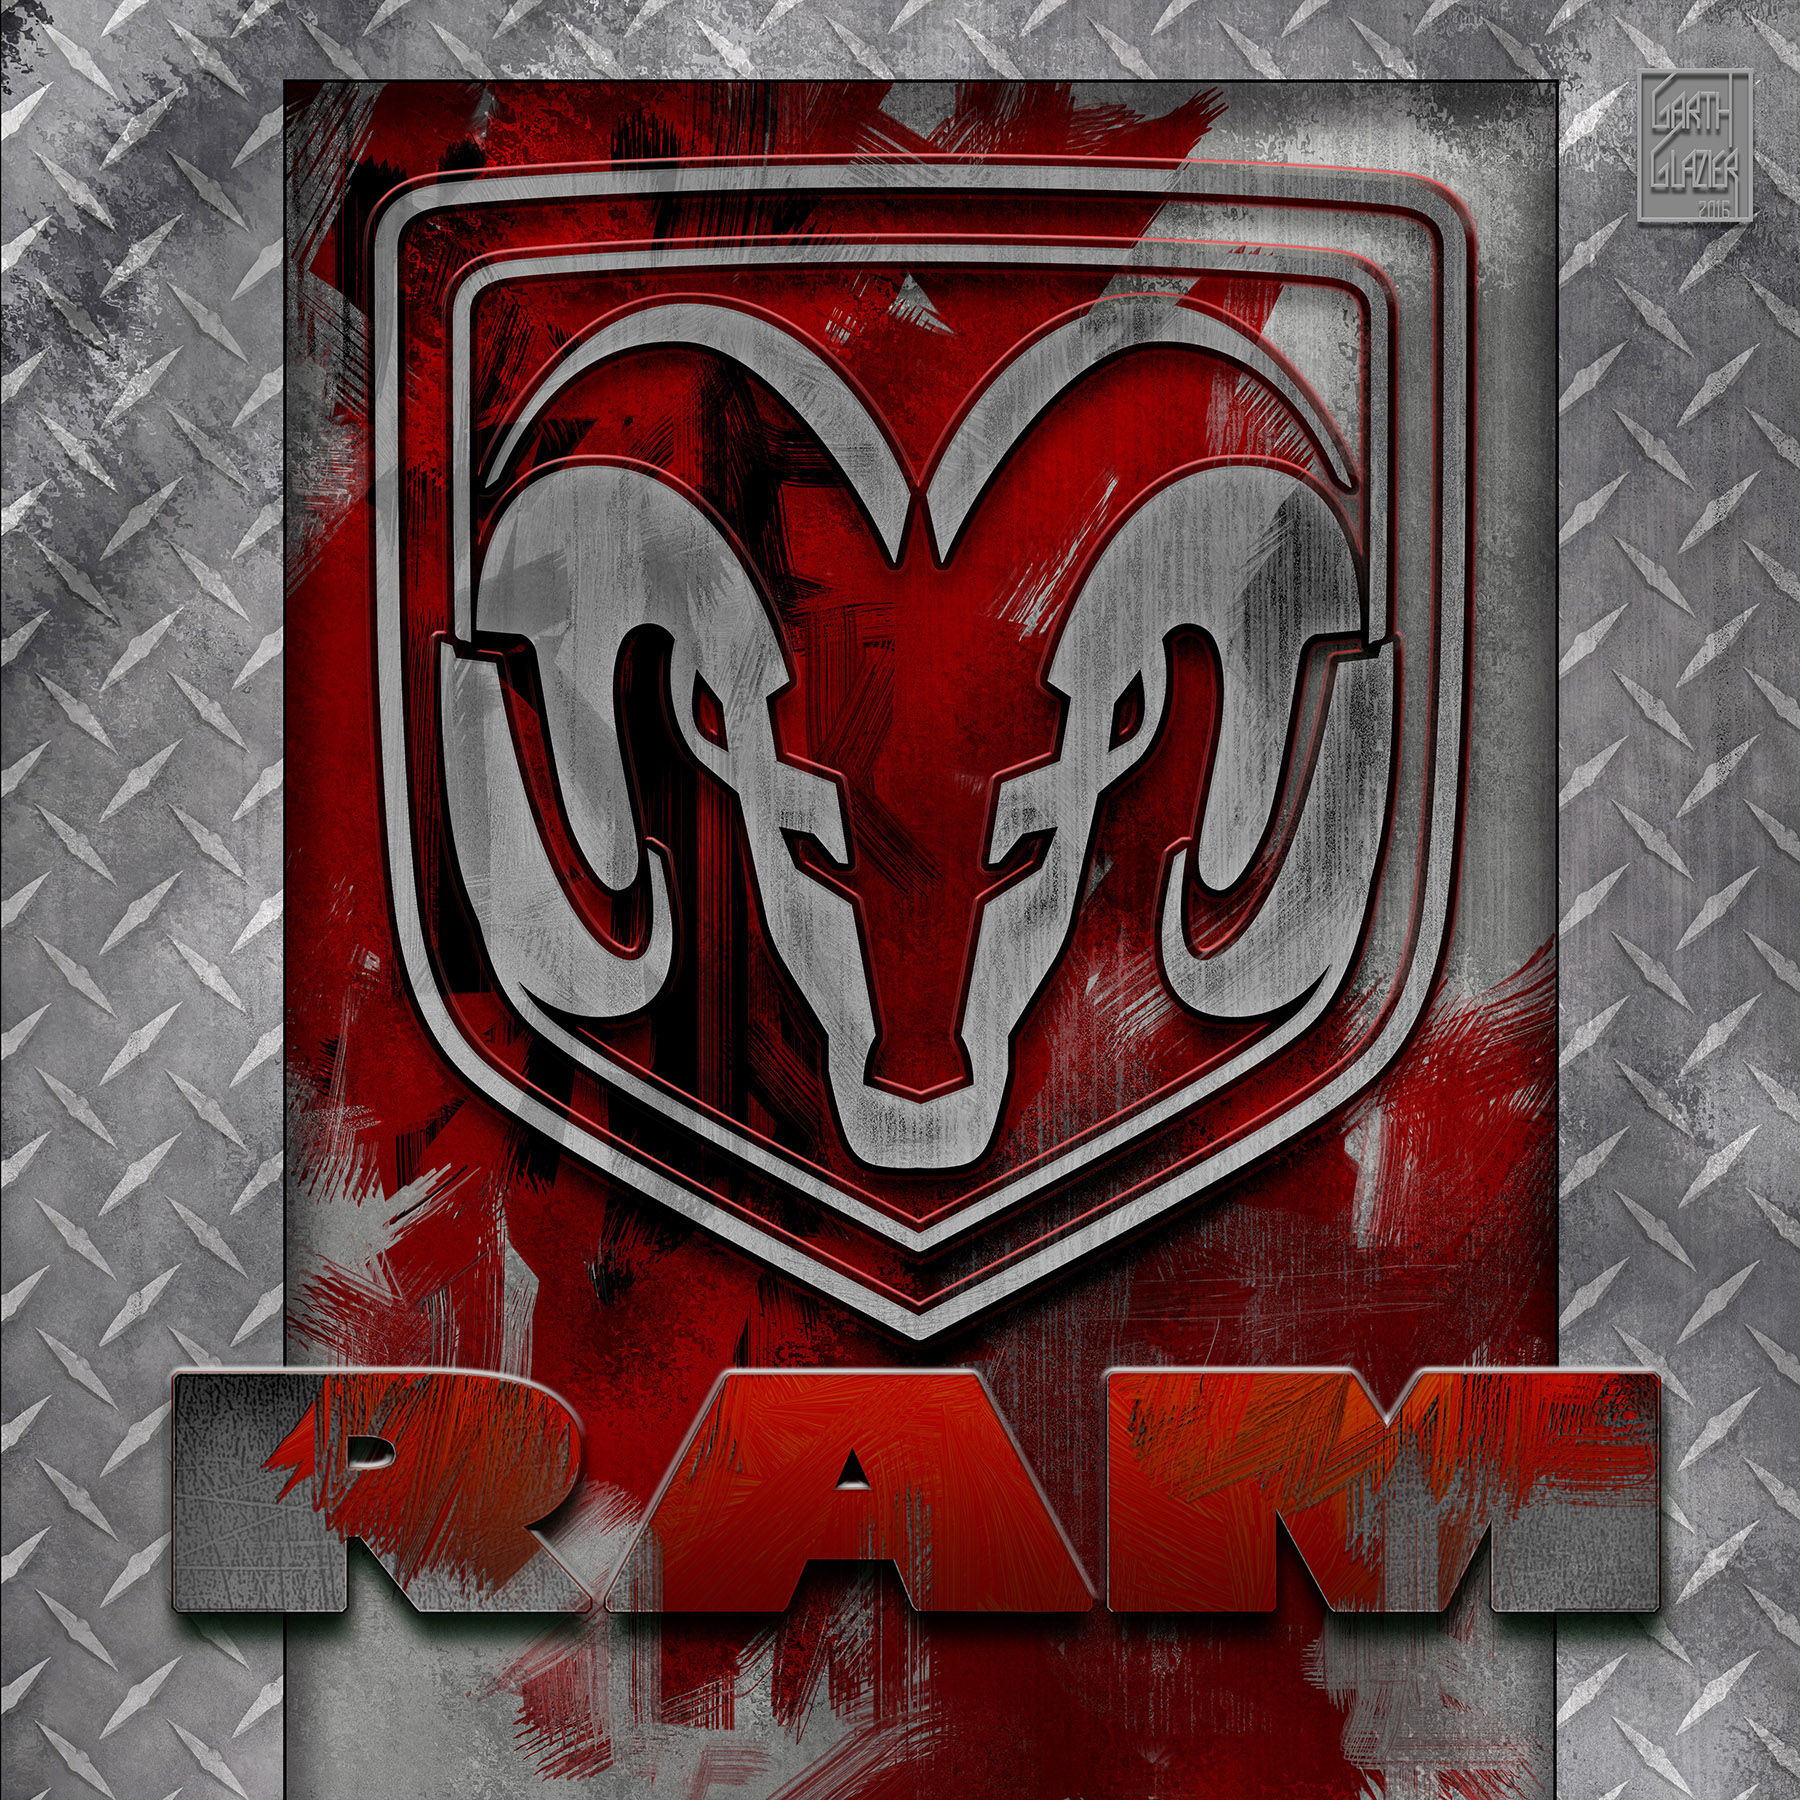 Garth Glazier Ram Amp Dodge Viper Logo Project Variations